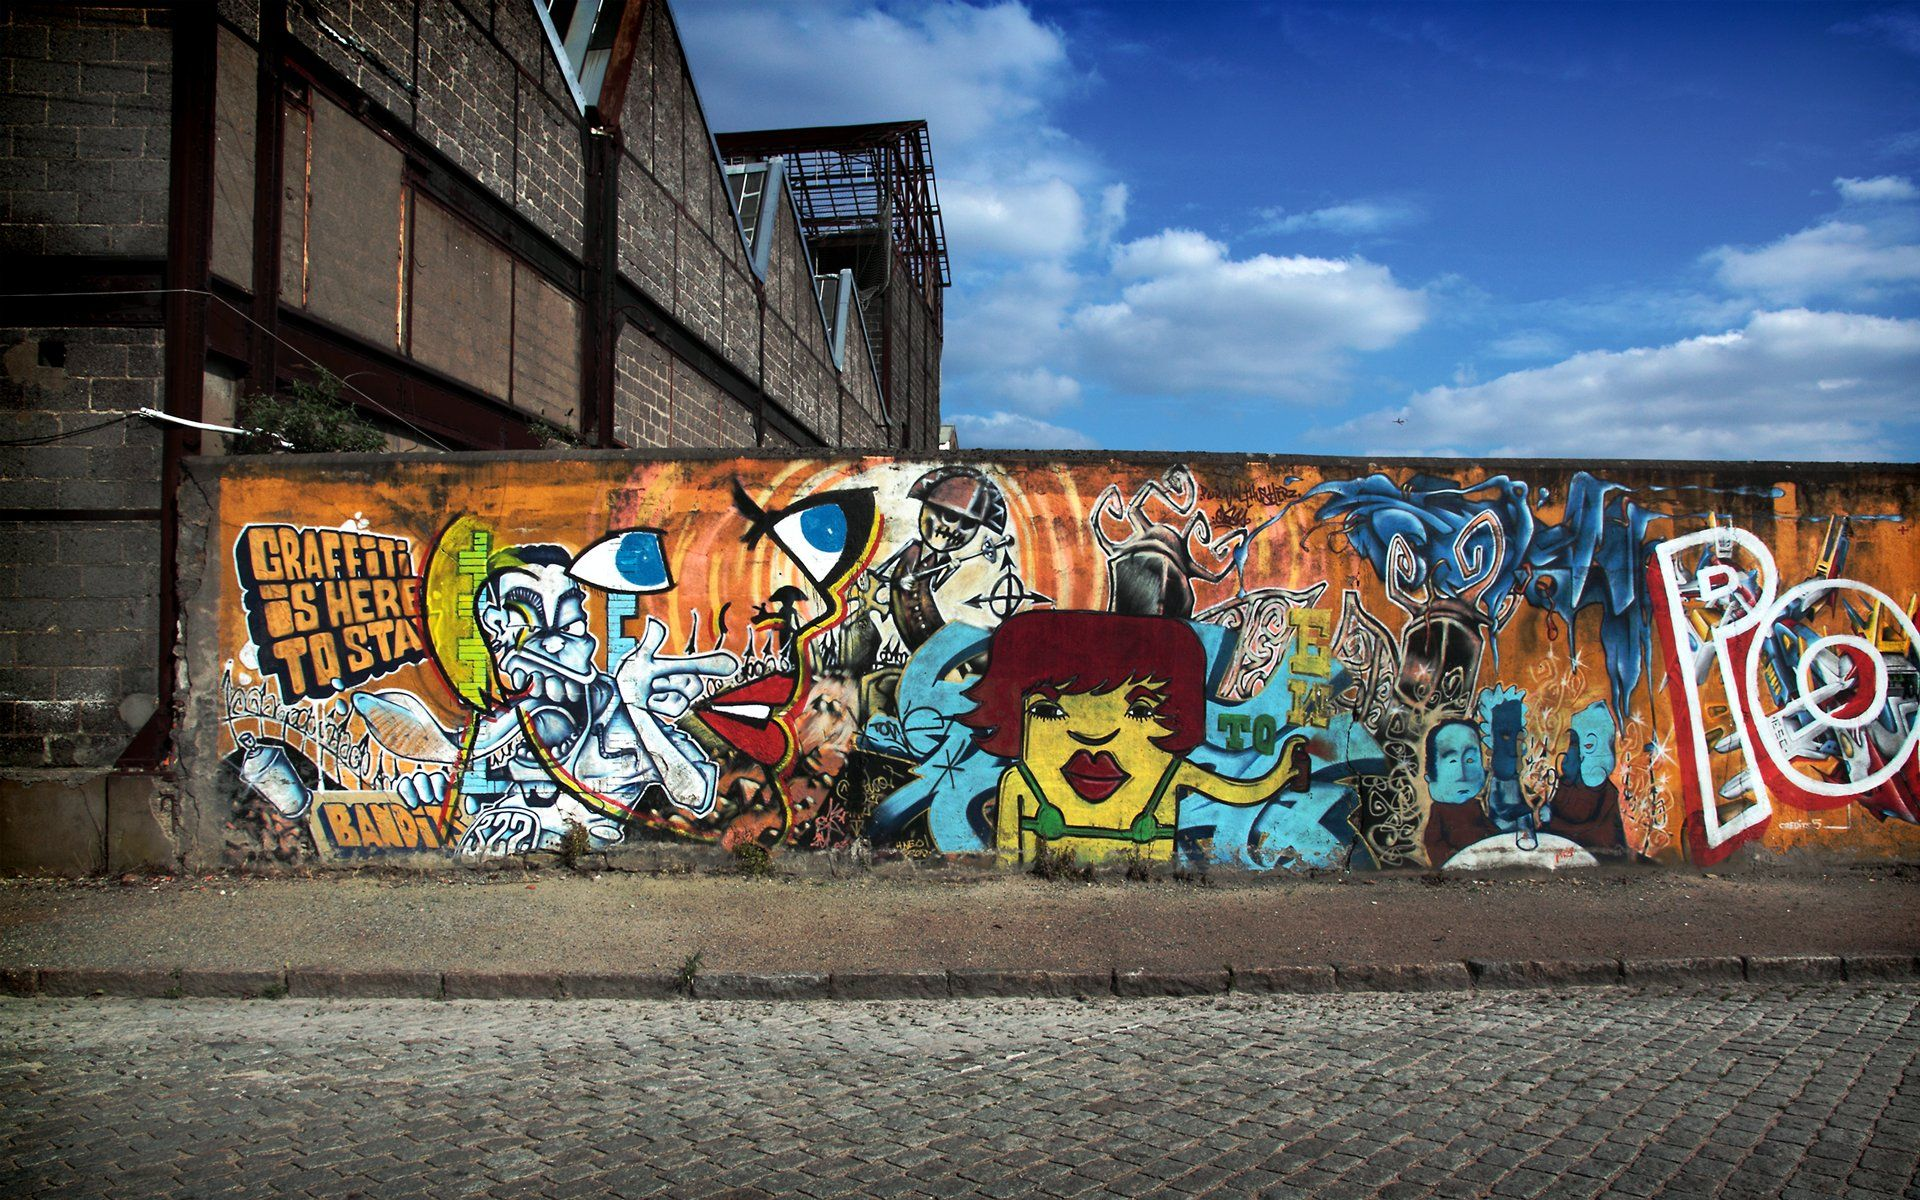 P Wallpaper Live Wallpapers Graffiti Artwork Graffiti Wallpaper D Street Art